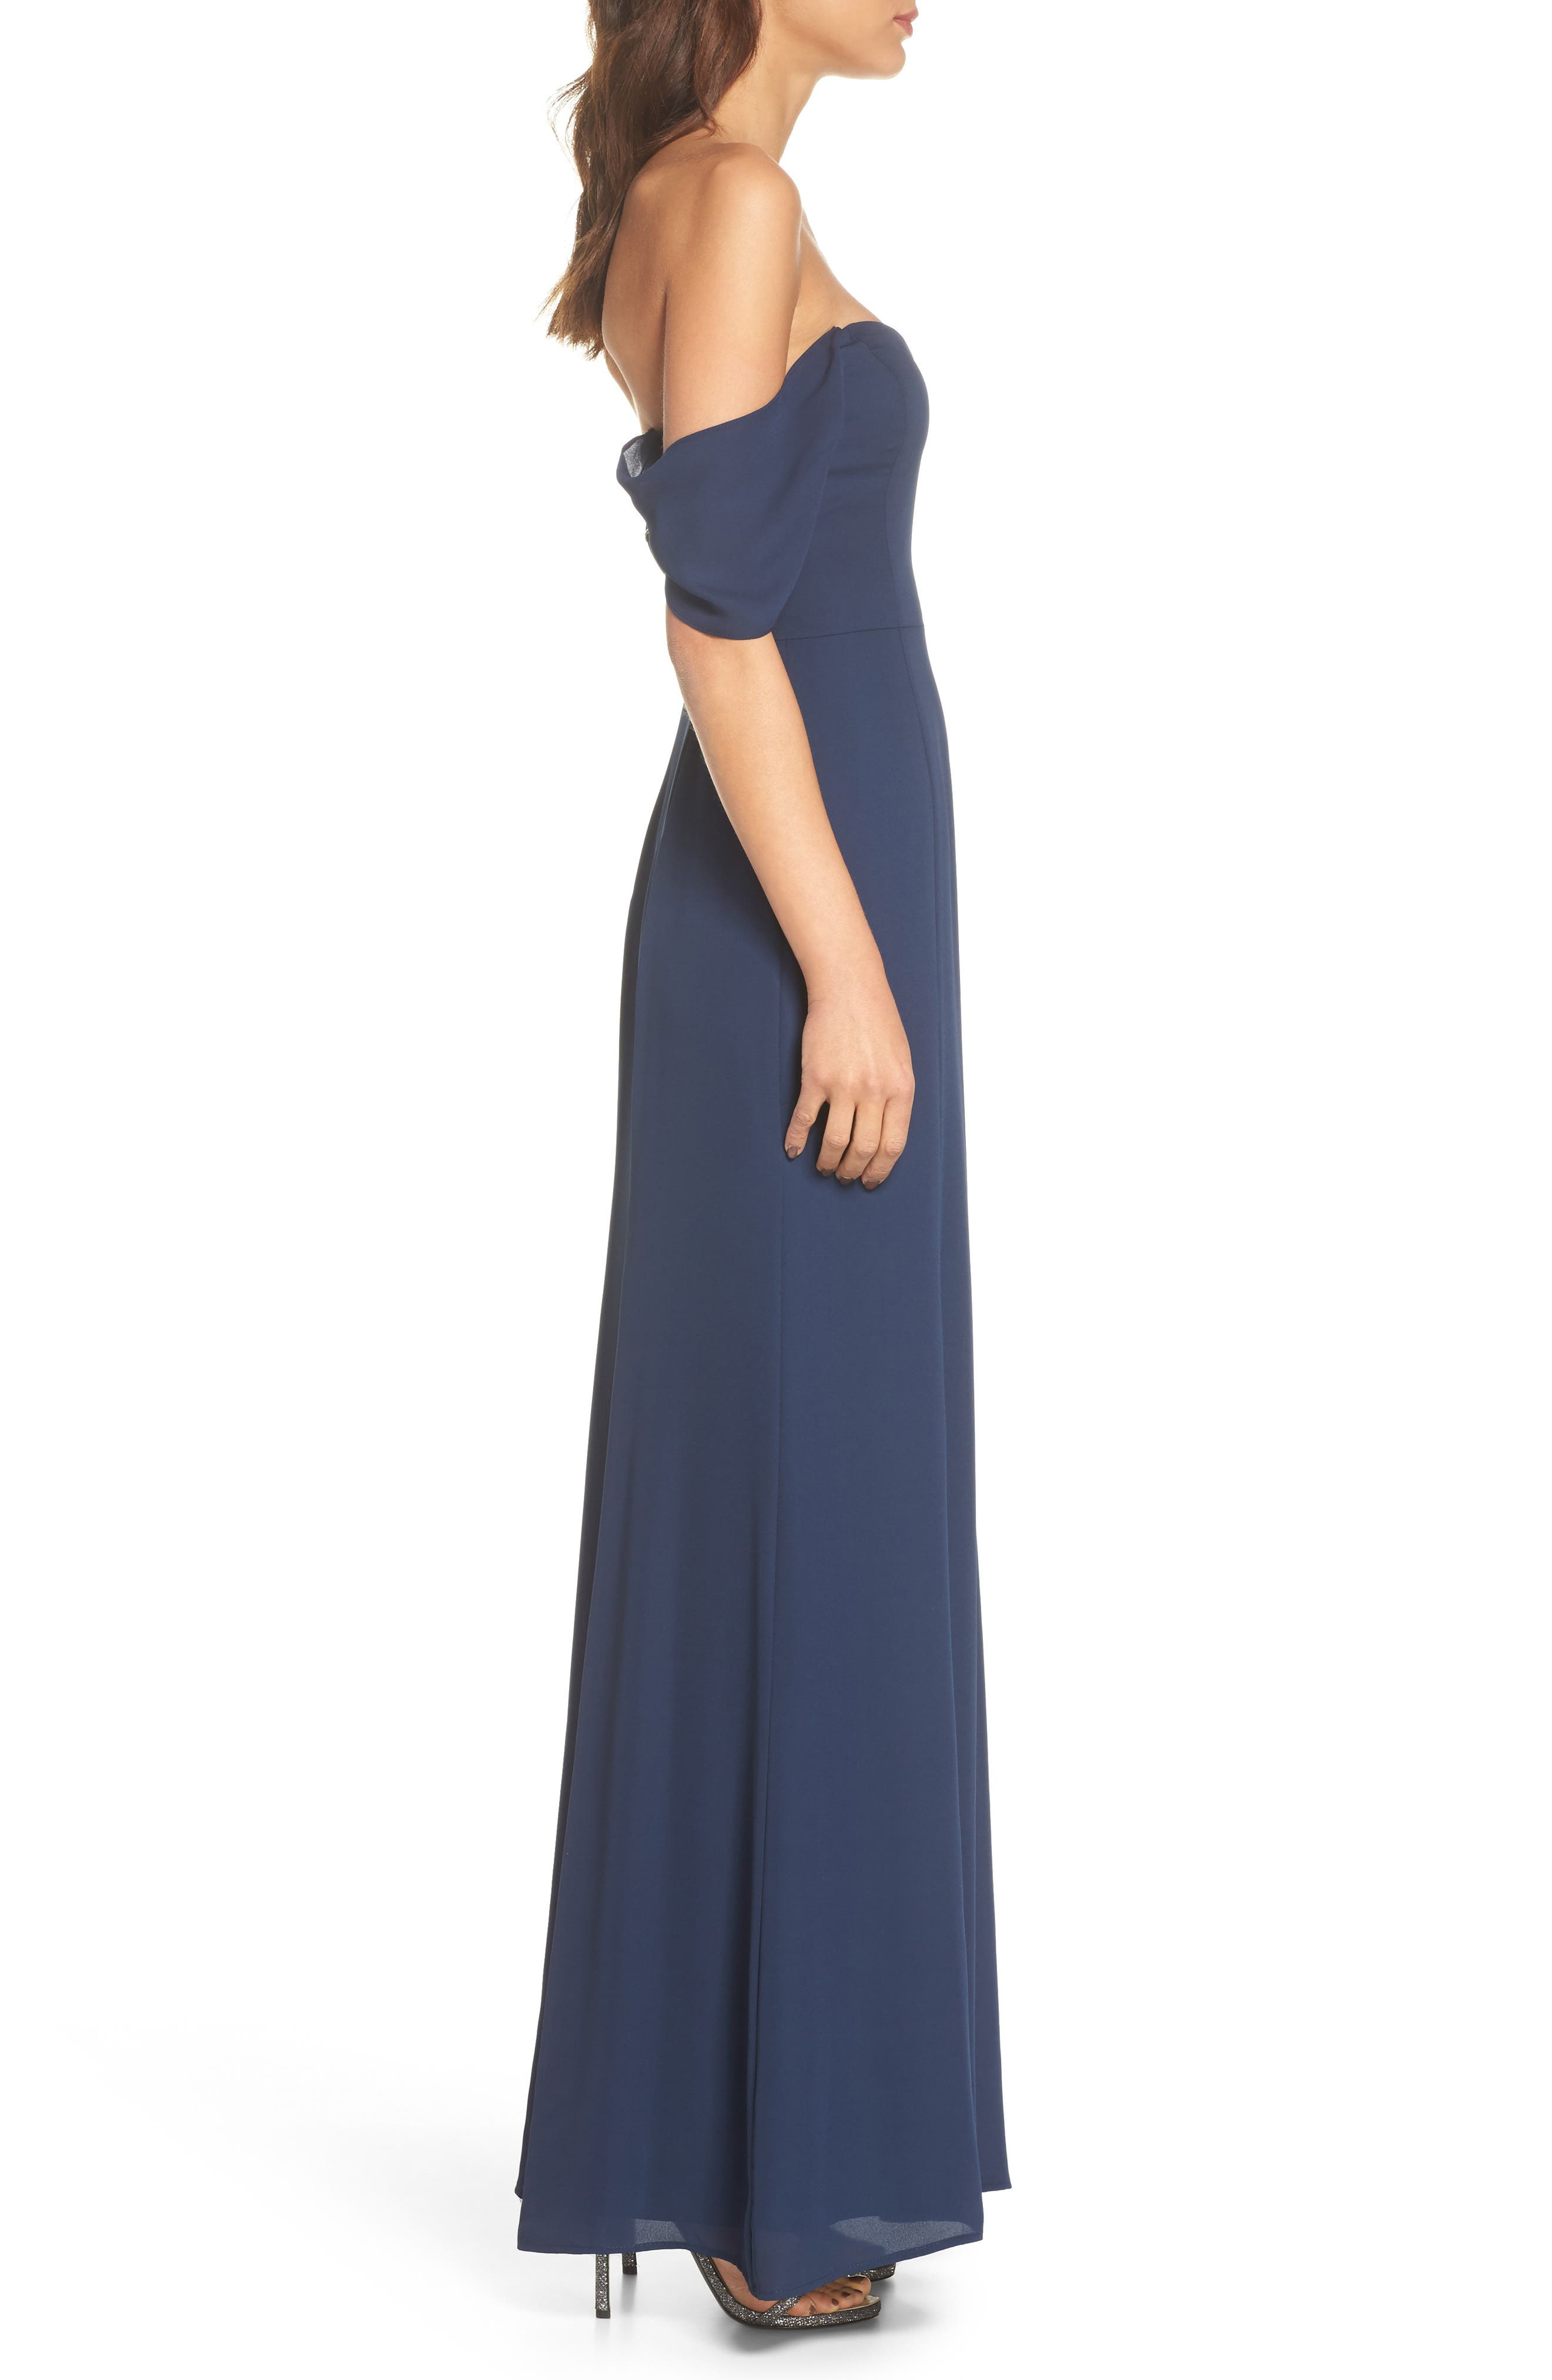 Rachel Off the Shoulder Gored Maxi Dress,                             Alternate thumbnail 6, color,